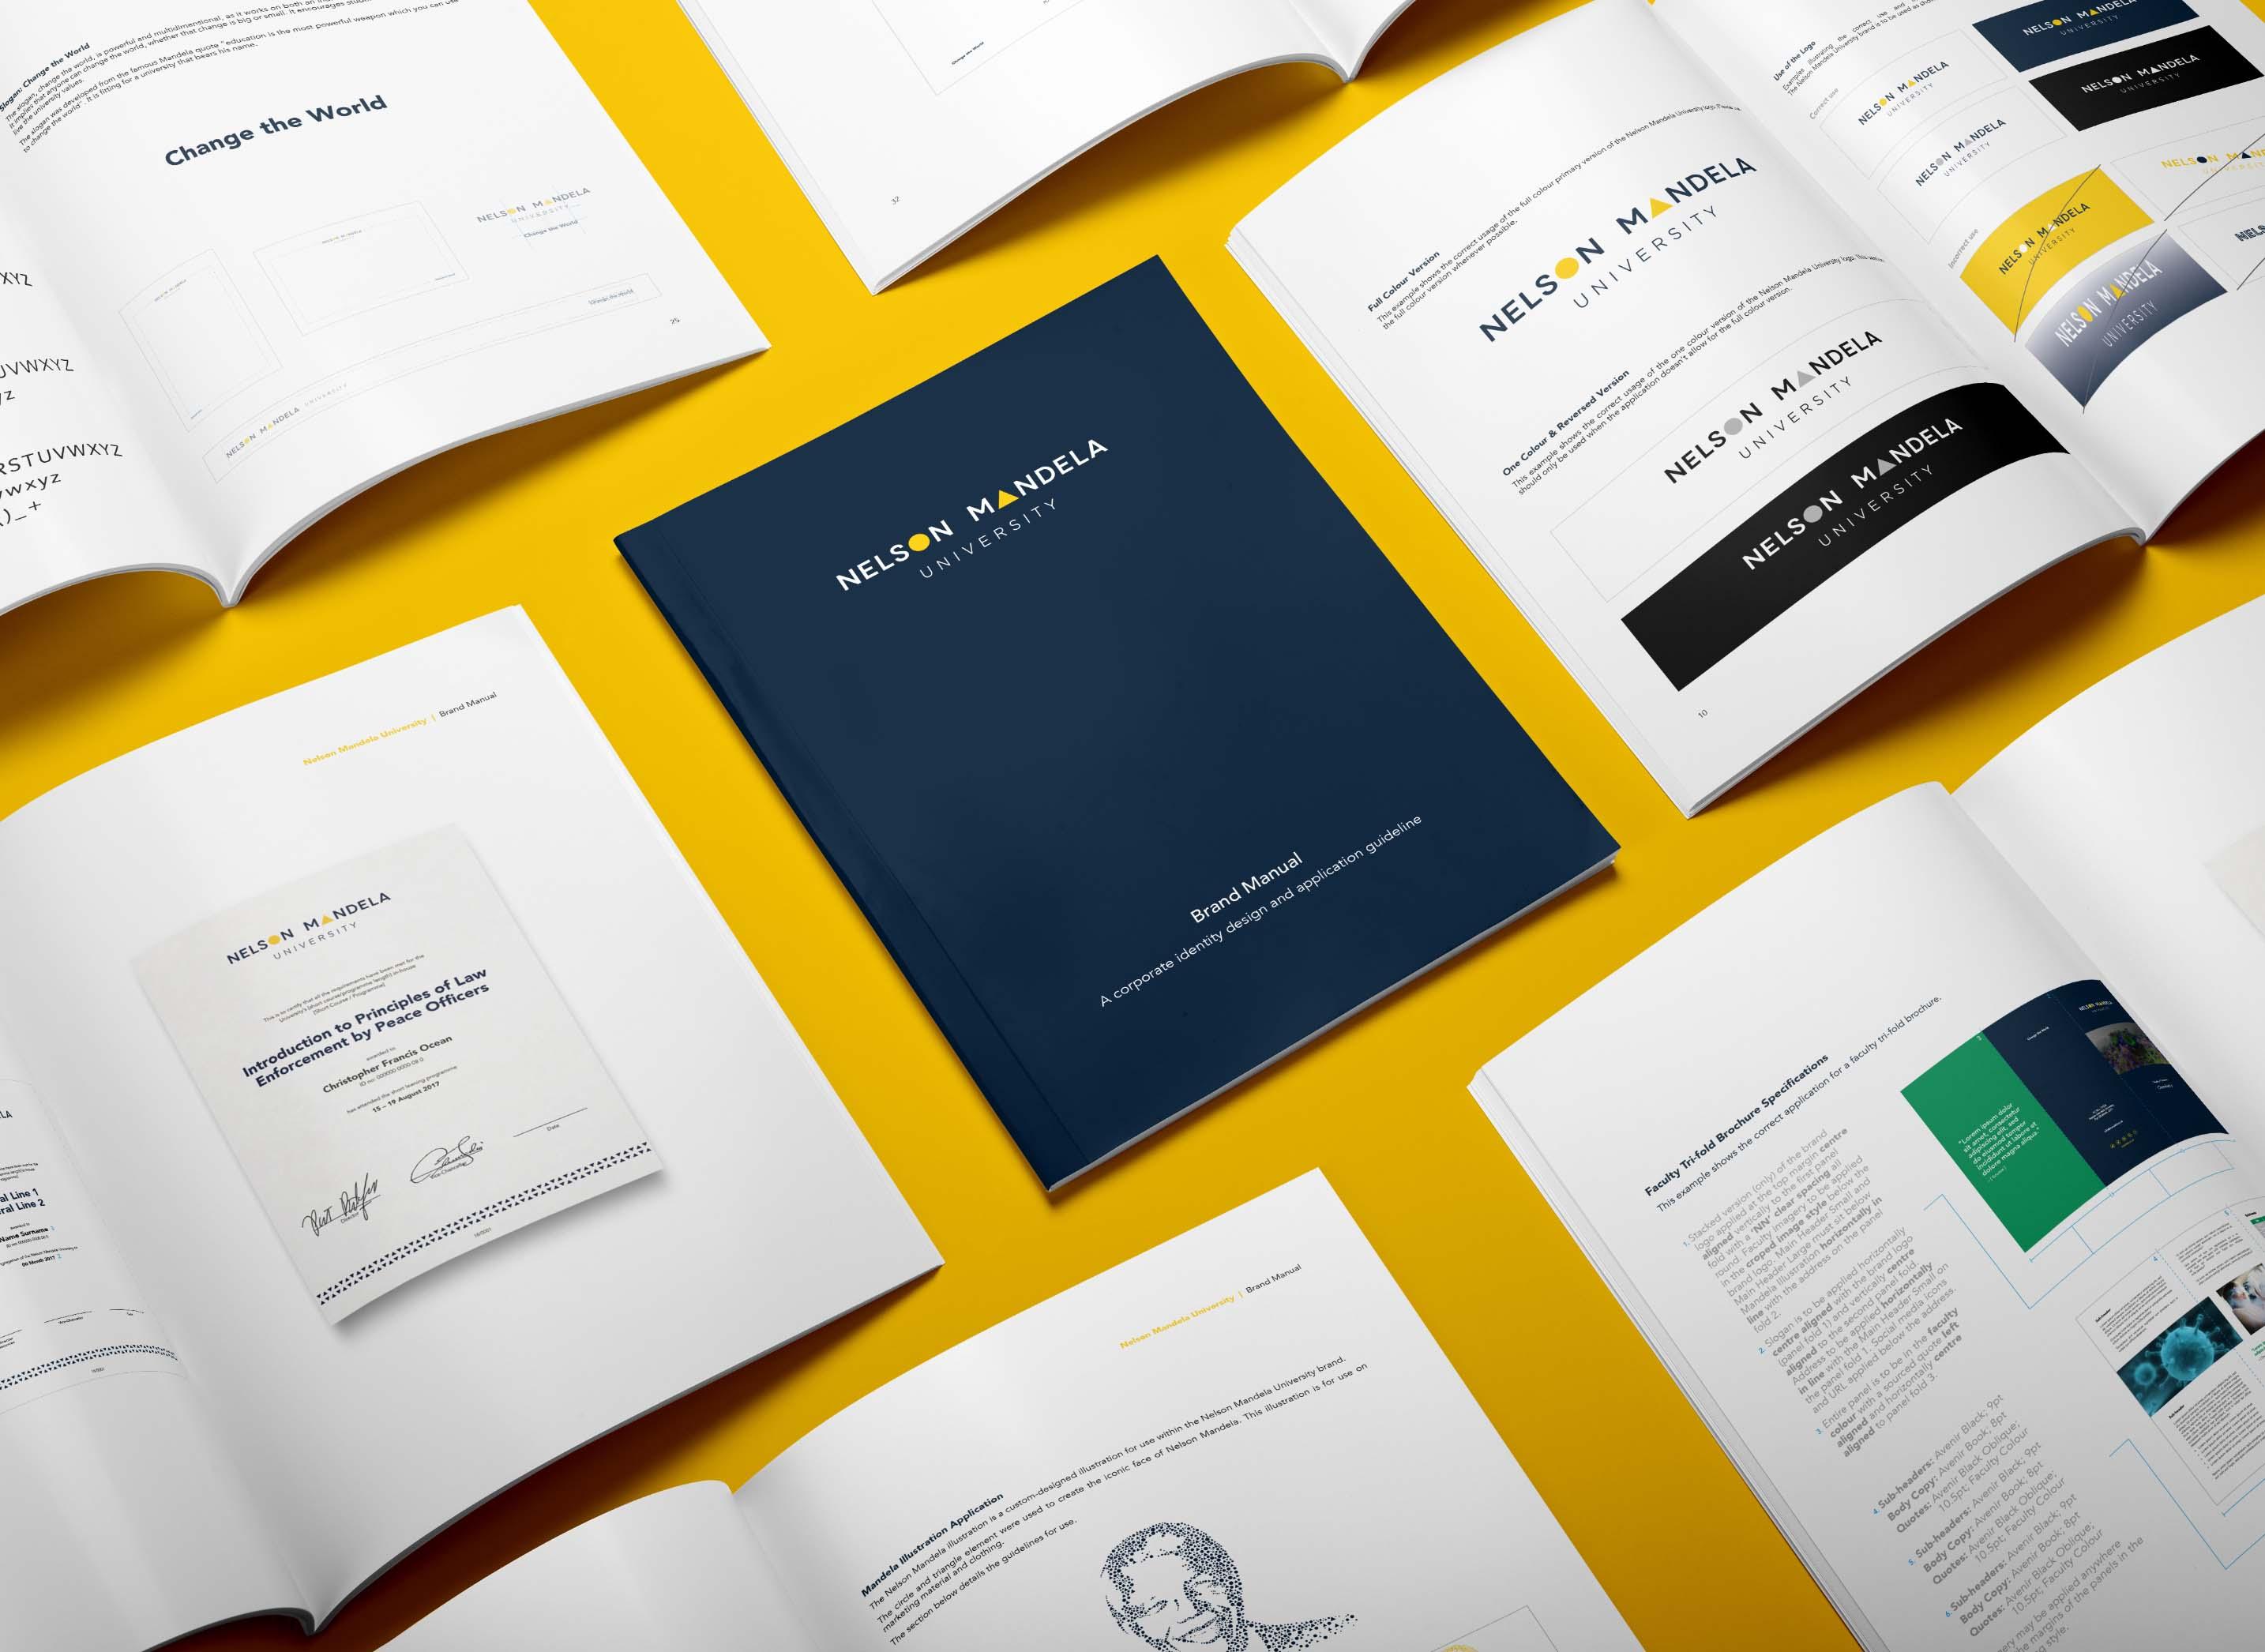 Creative Caterpillar client Nelson Mandela University brand manual.